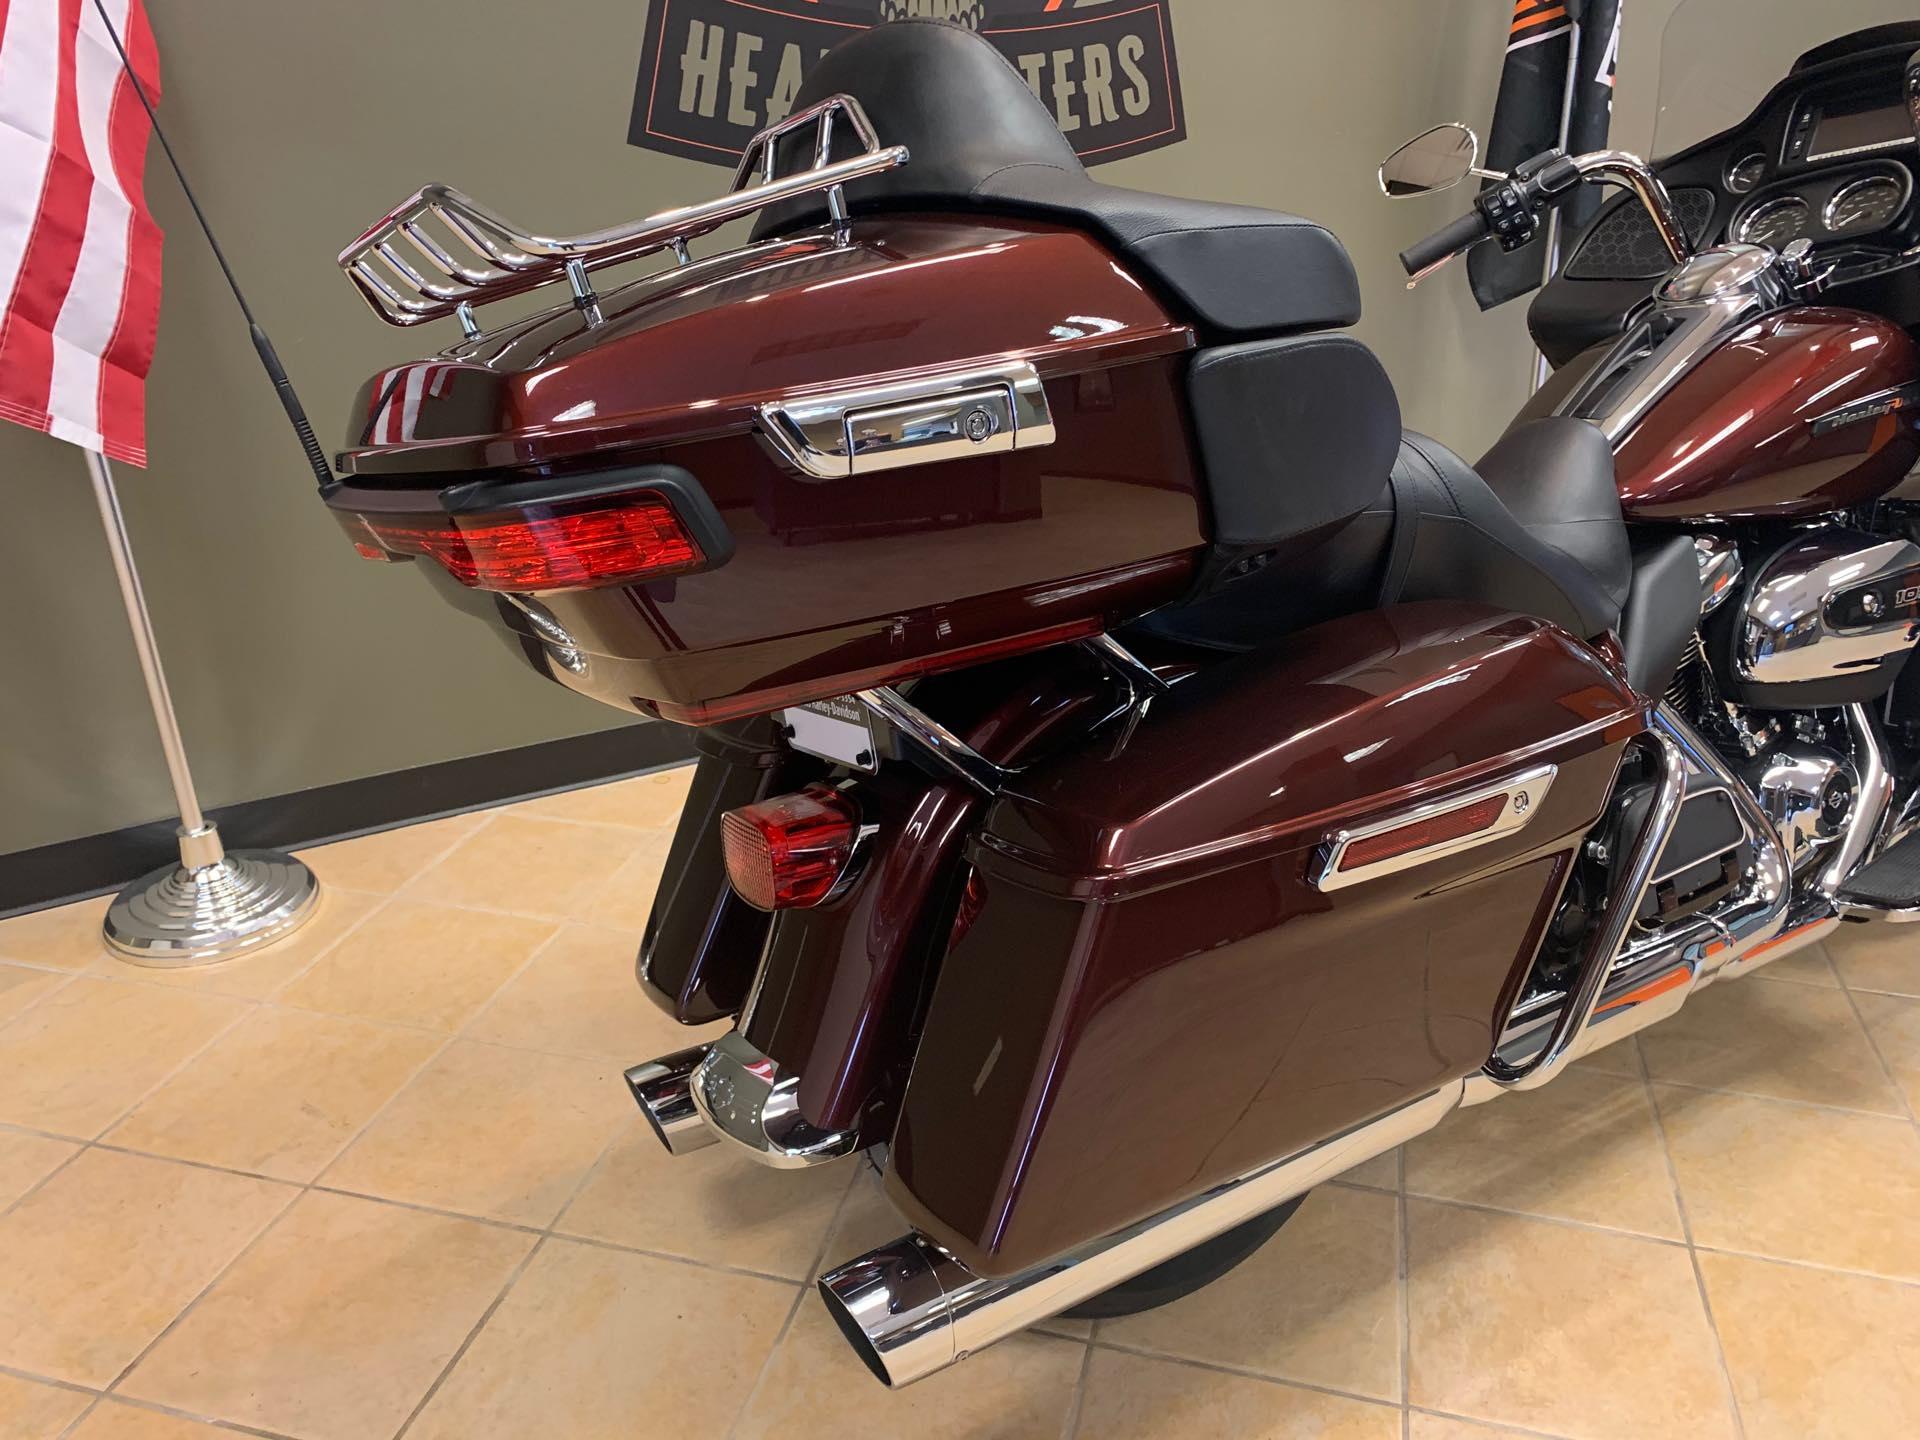 2018 Harley-Davidson Road Glide Ultra at Loess Hills Harley-Davidson